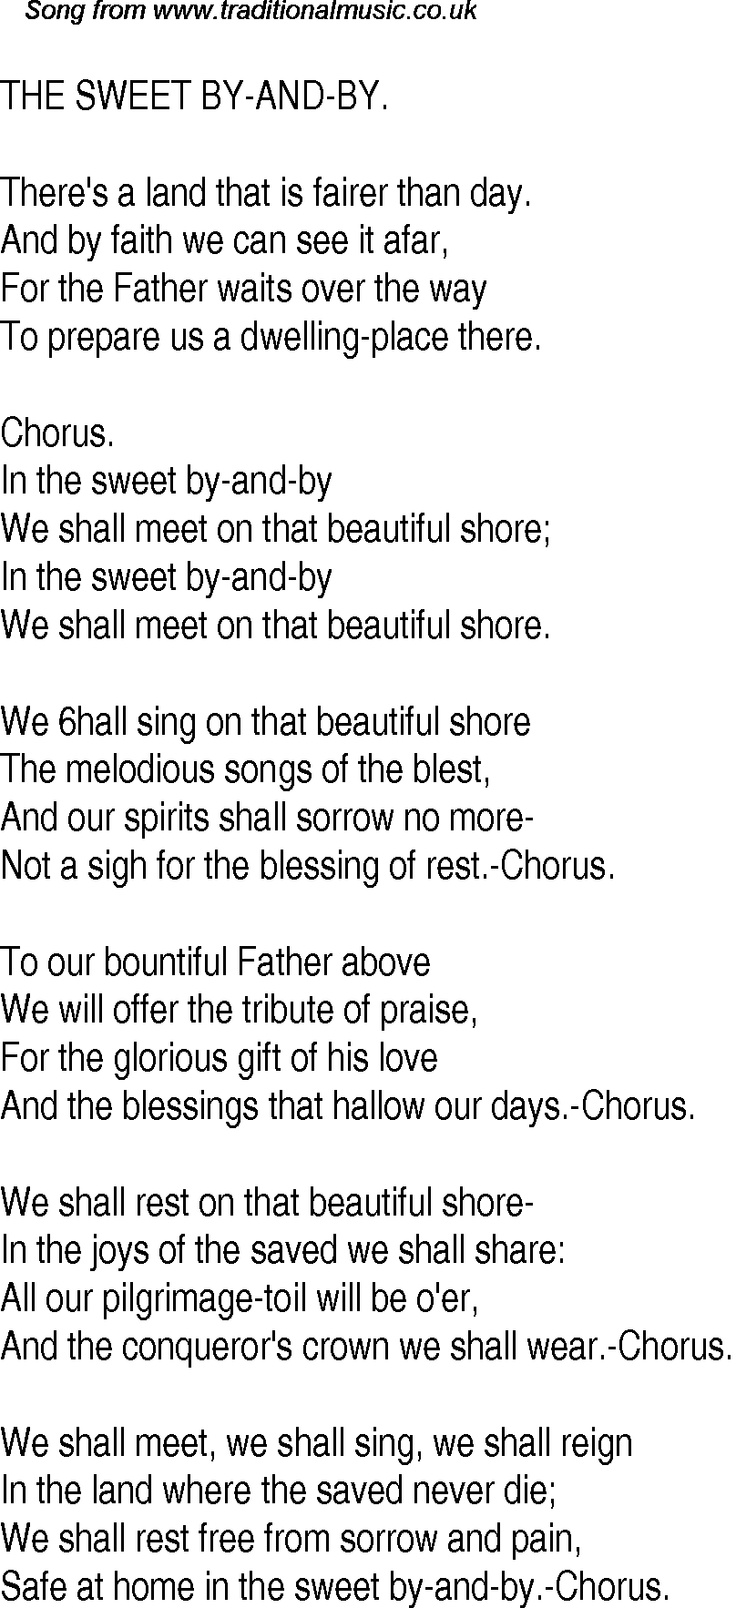 Ode to the motherland lyrics